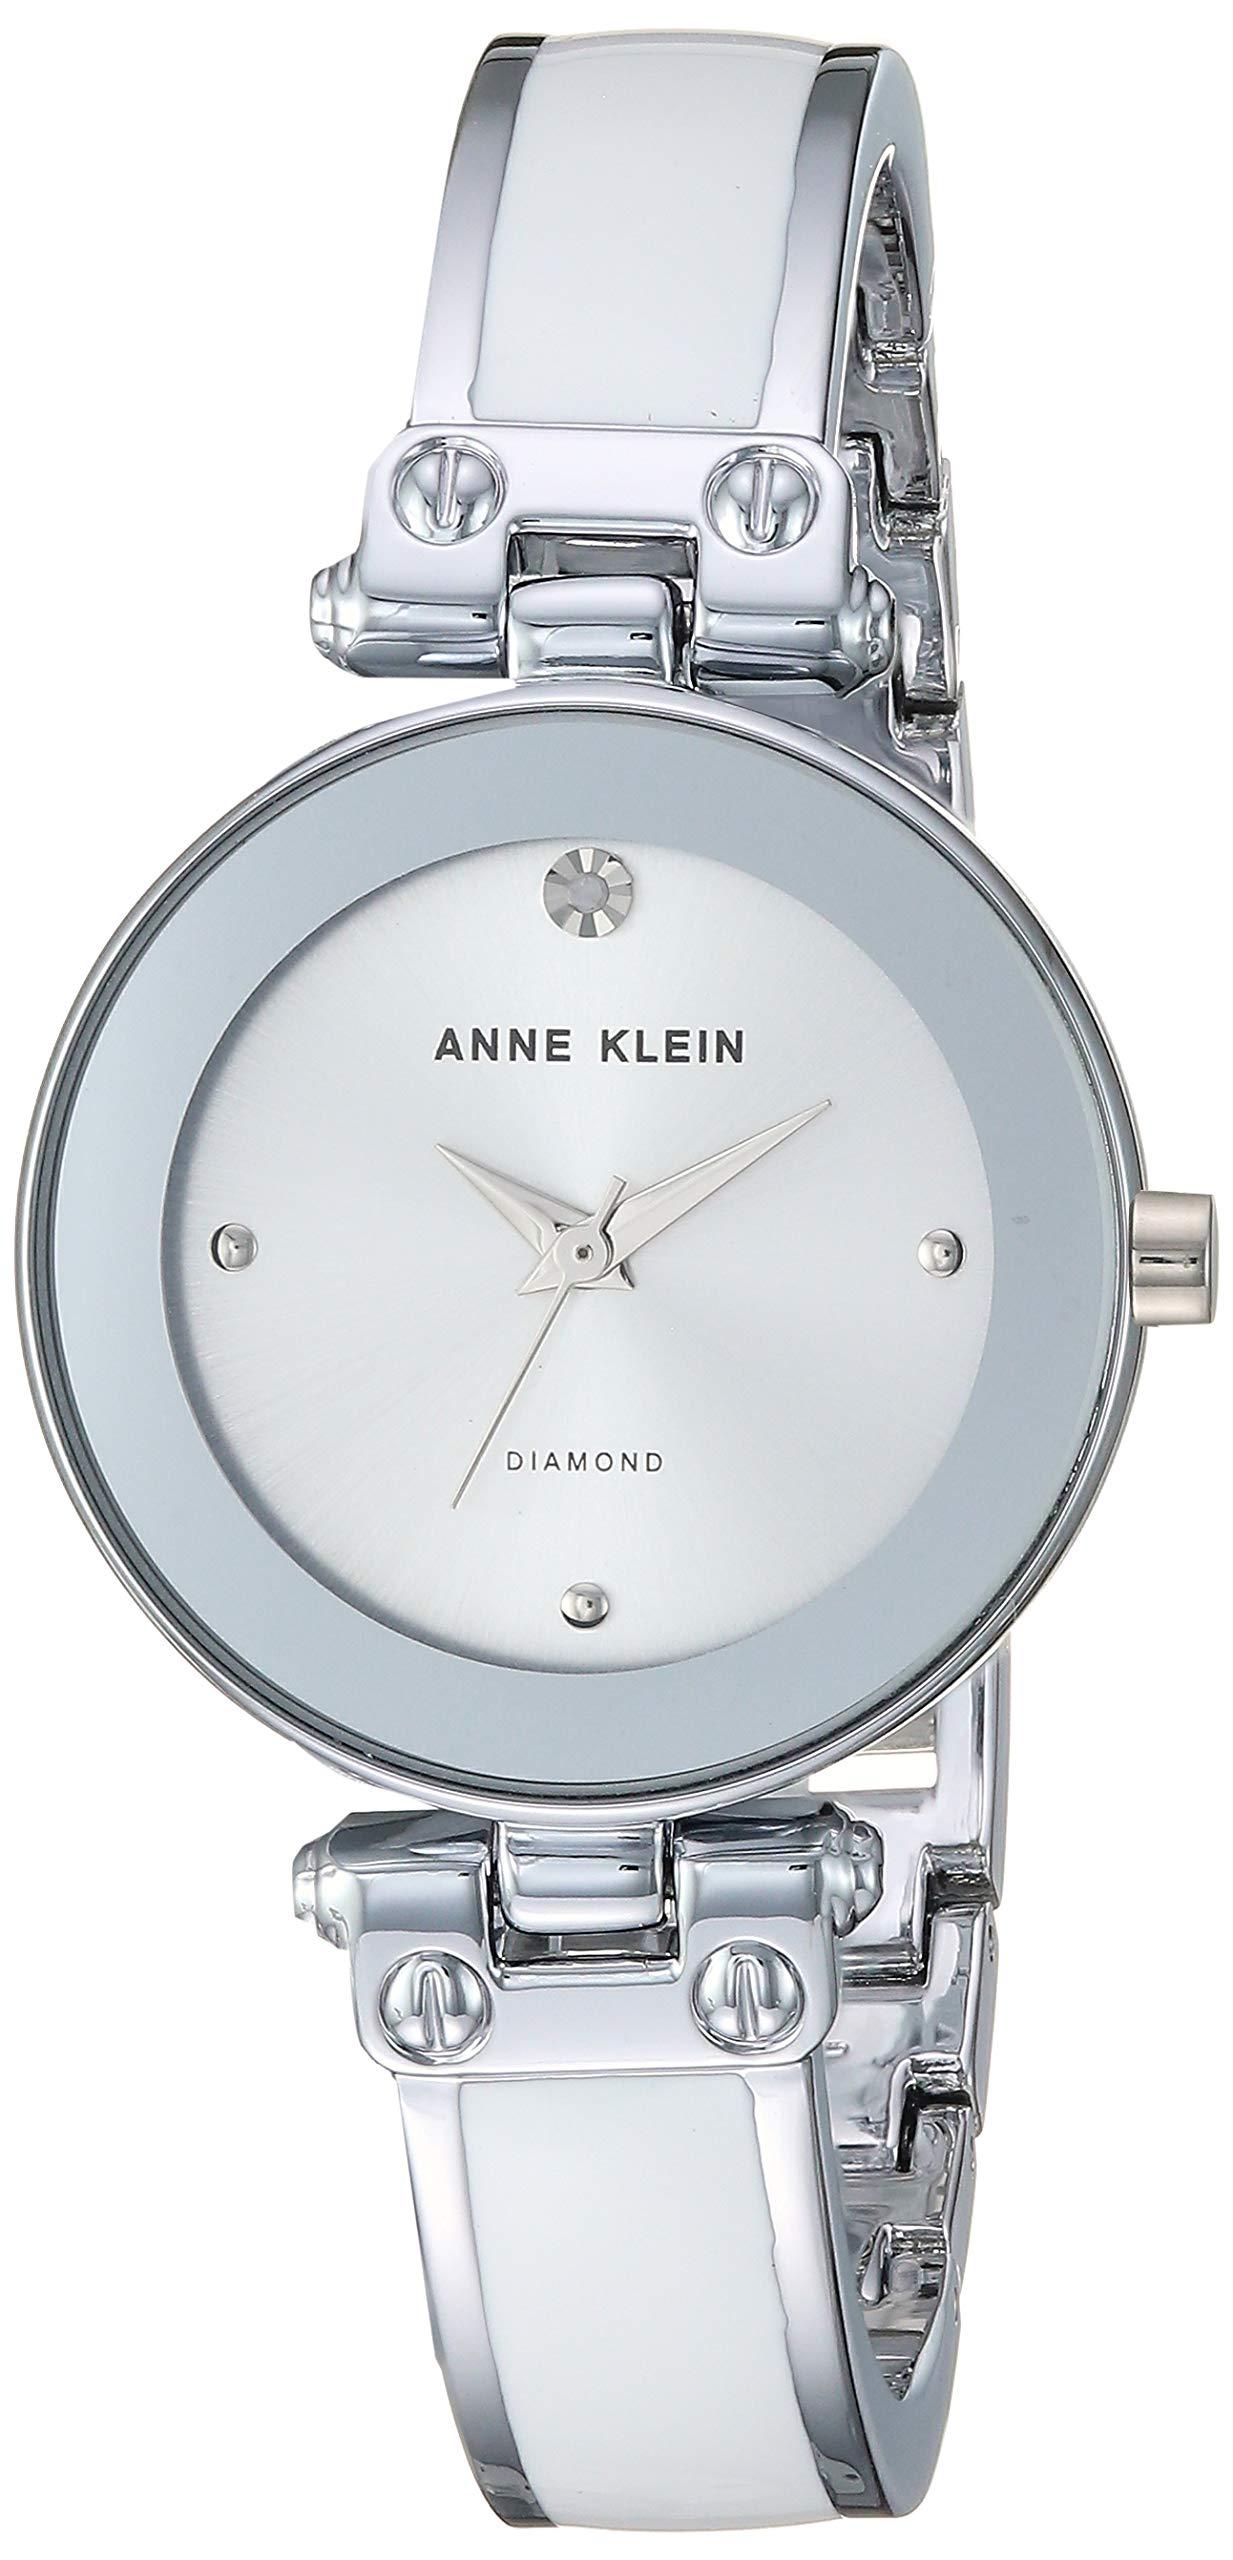 Anne Klein Women's AK/1981WTSV Swarovski Crystal Accented Silver-Tone and White Bangle Watch by Anne Klein